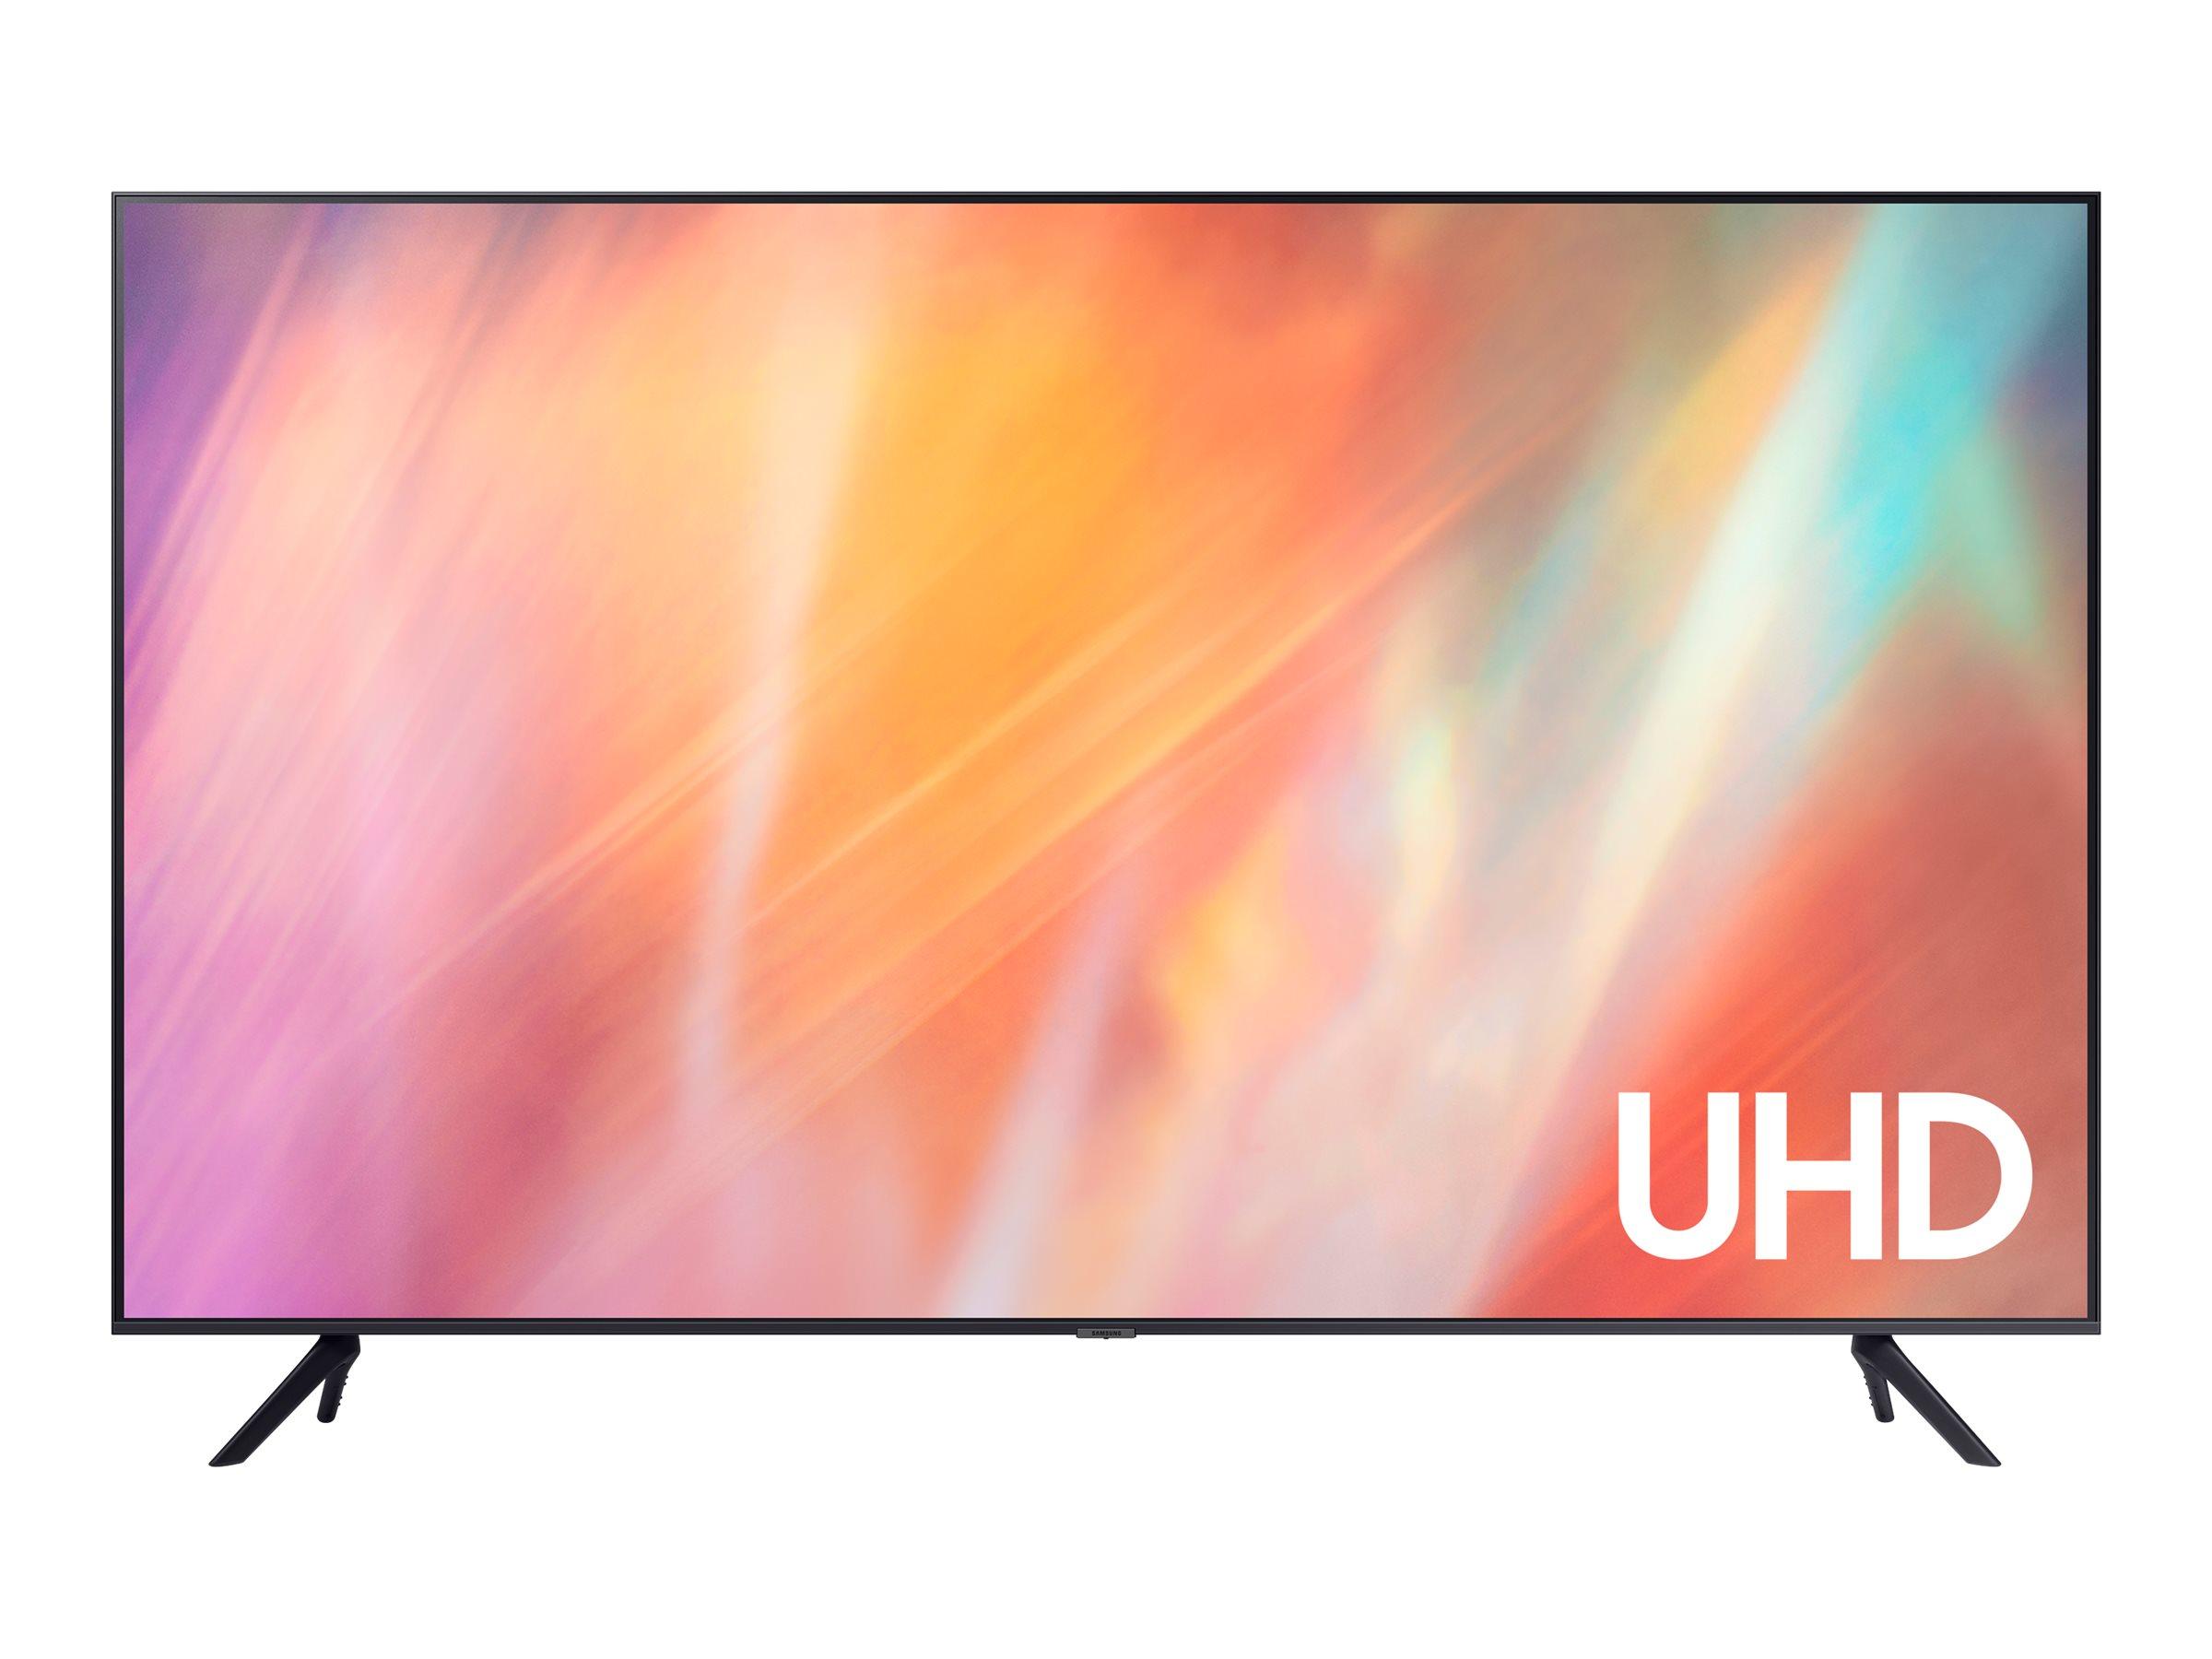 "Samsung BE43A-H - 107.9 cm (43"") Diagonalklasse BEA-H Series LCD-TV mit LED-Hintergrundbeleuchtung - Digital Signage - Smart TV - Tizen OS - 4K UHD (2160p)"